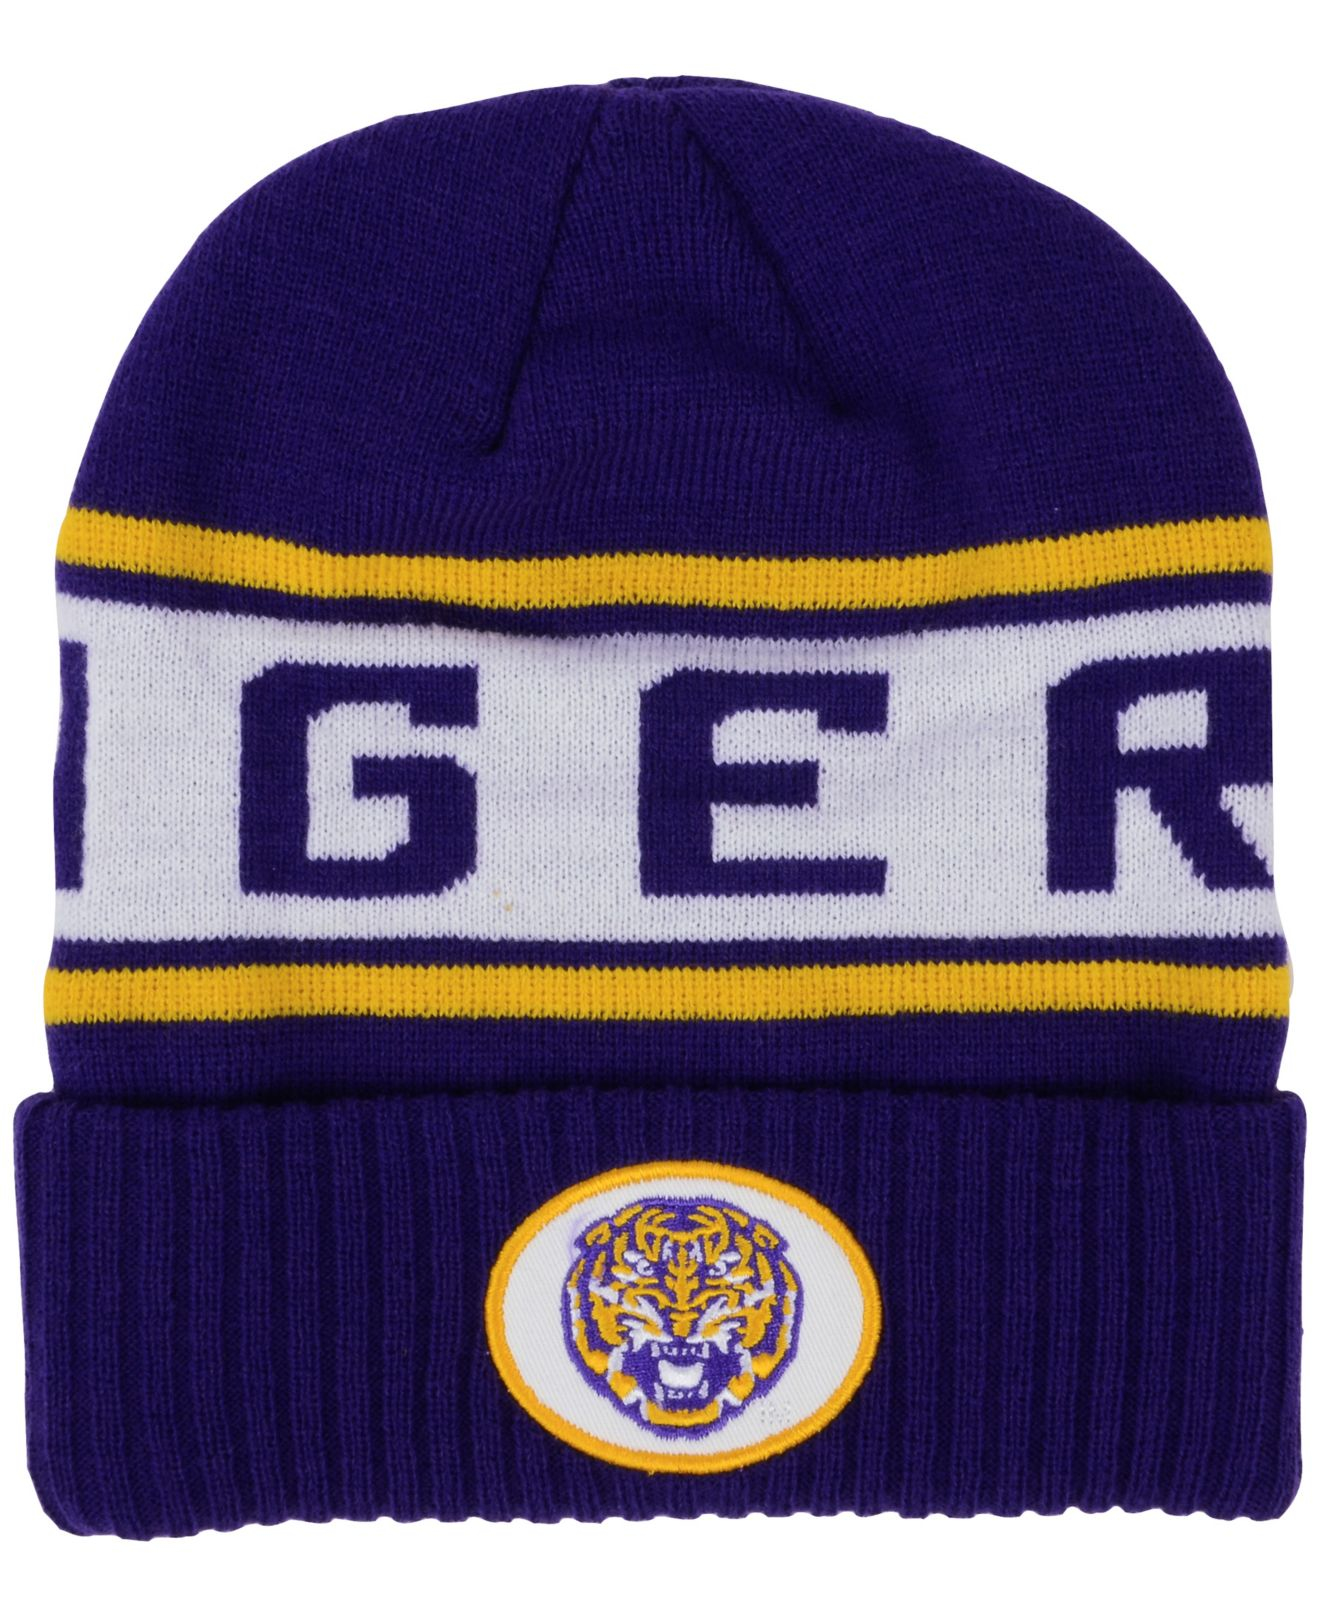 9d197856d87 ... hot lyst nike lsu tigers sideline knit hat in blue for men 3156a f4b06